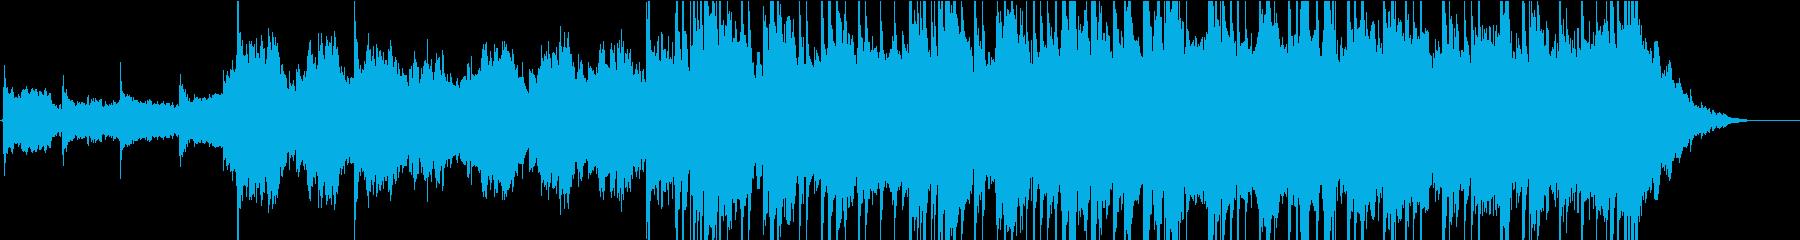 UKロック風バンドとストリングスの再生済みの波形